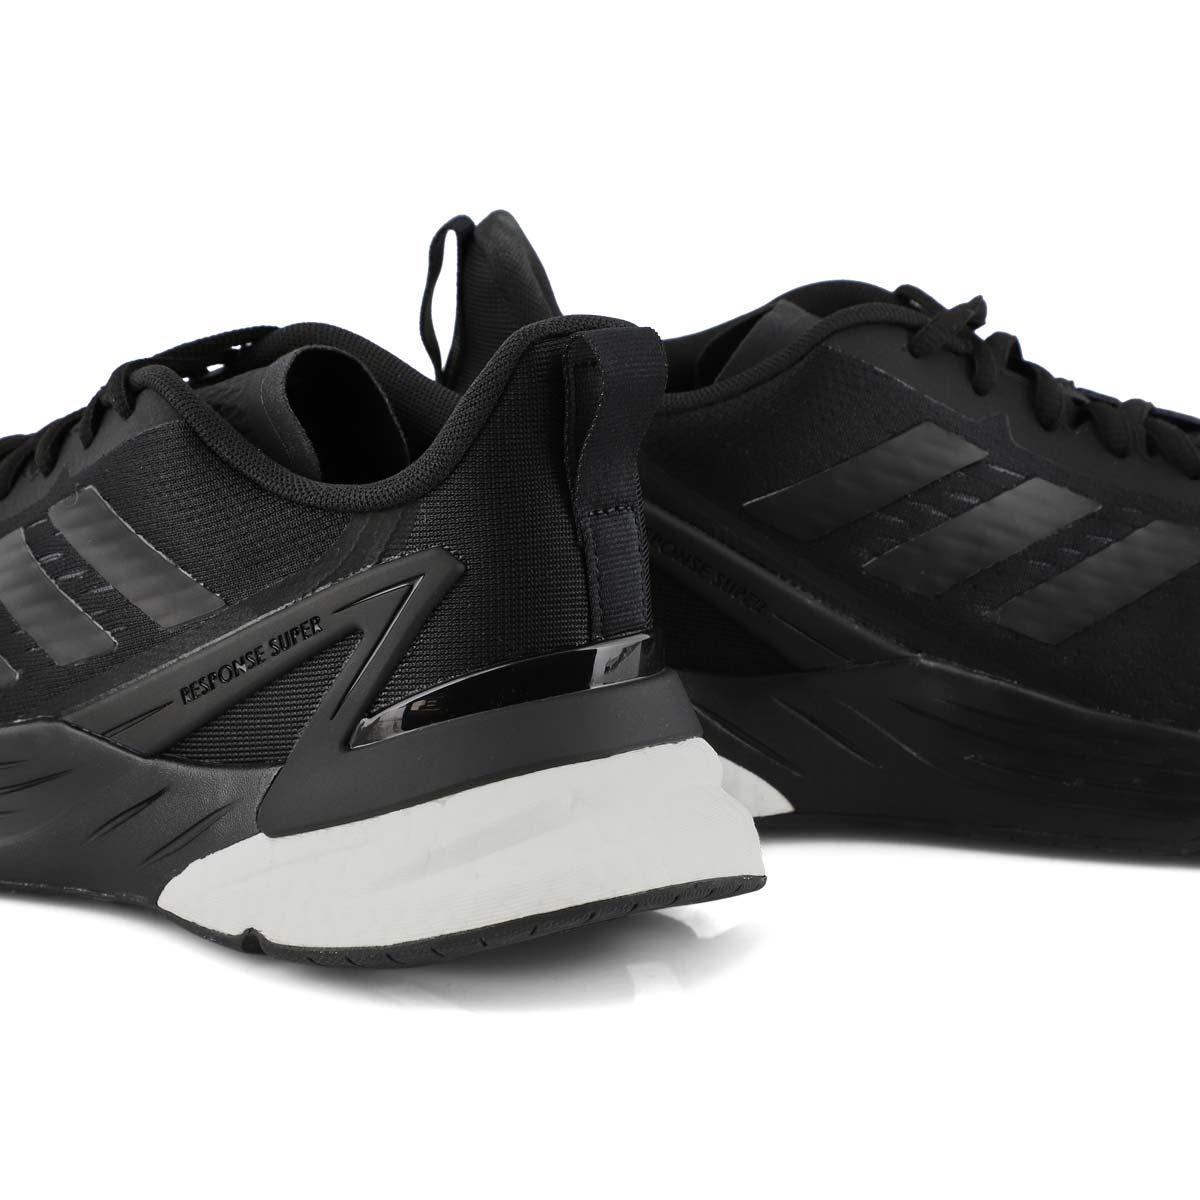 Men's Response Super Running Shoe - Black/Grey